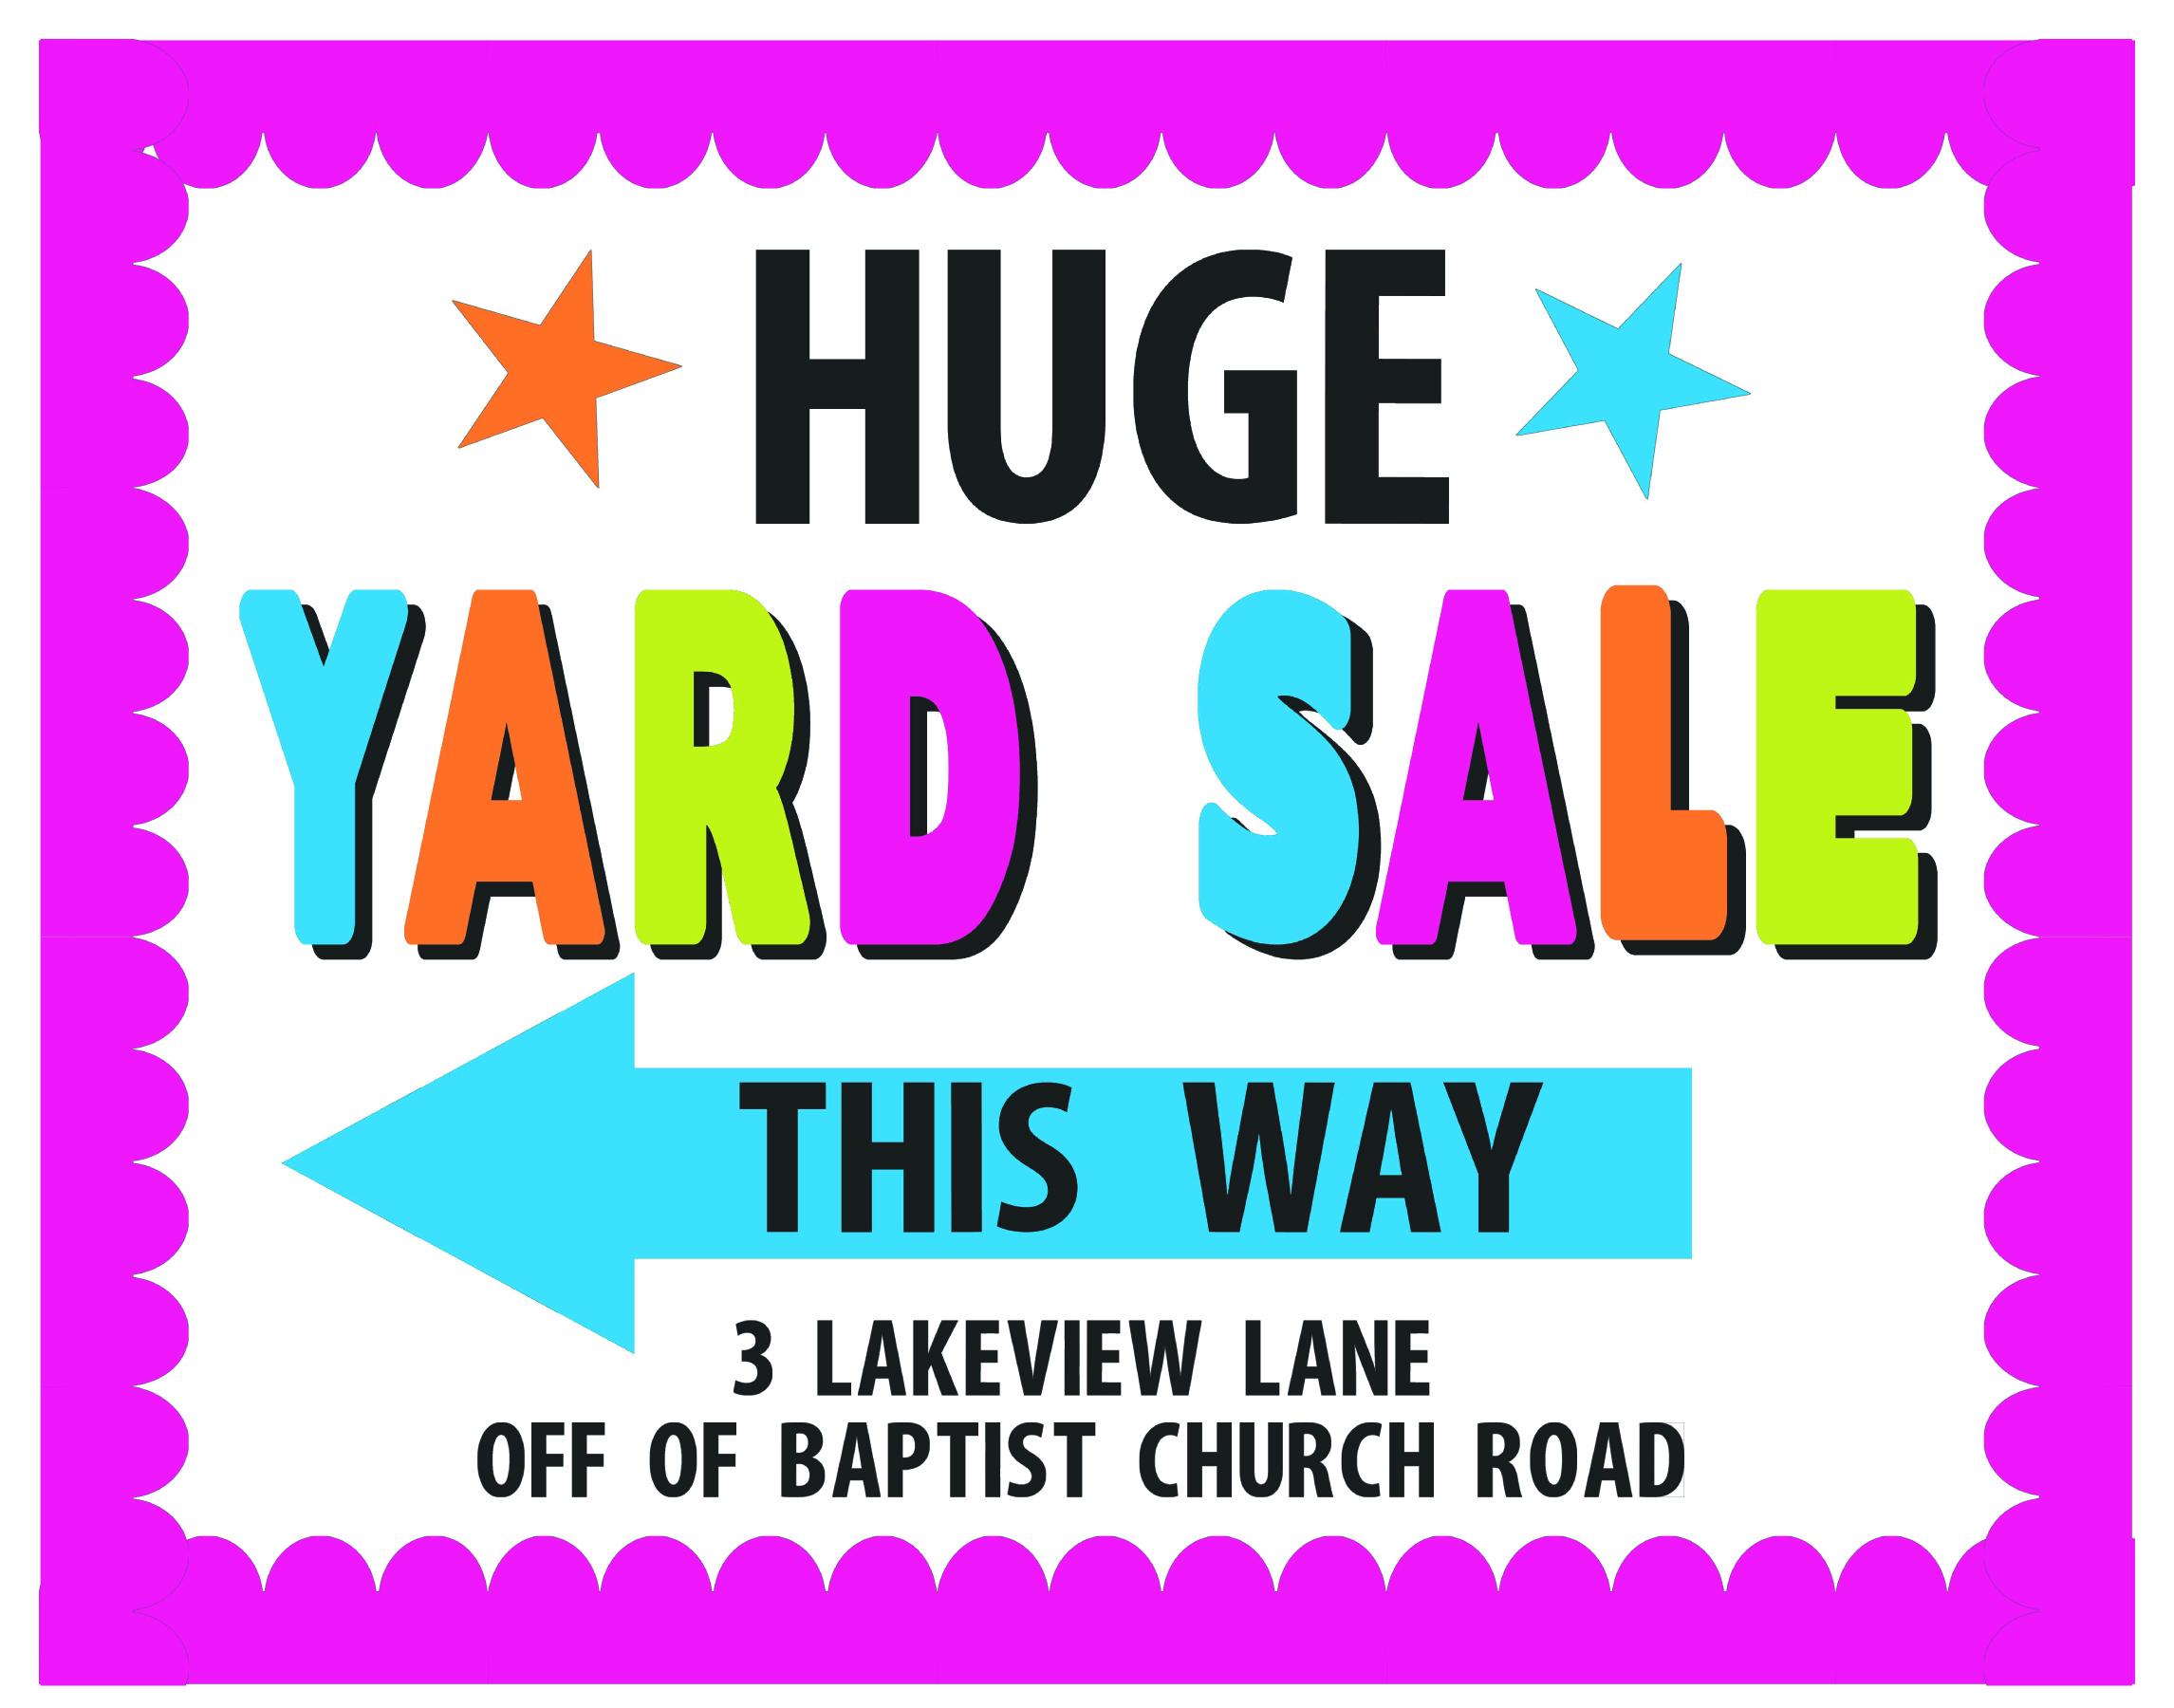 2291x1800 Huge Yard Sale! Artskills Yard Sale, Fundraising